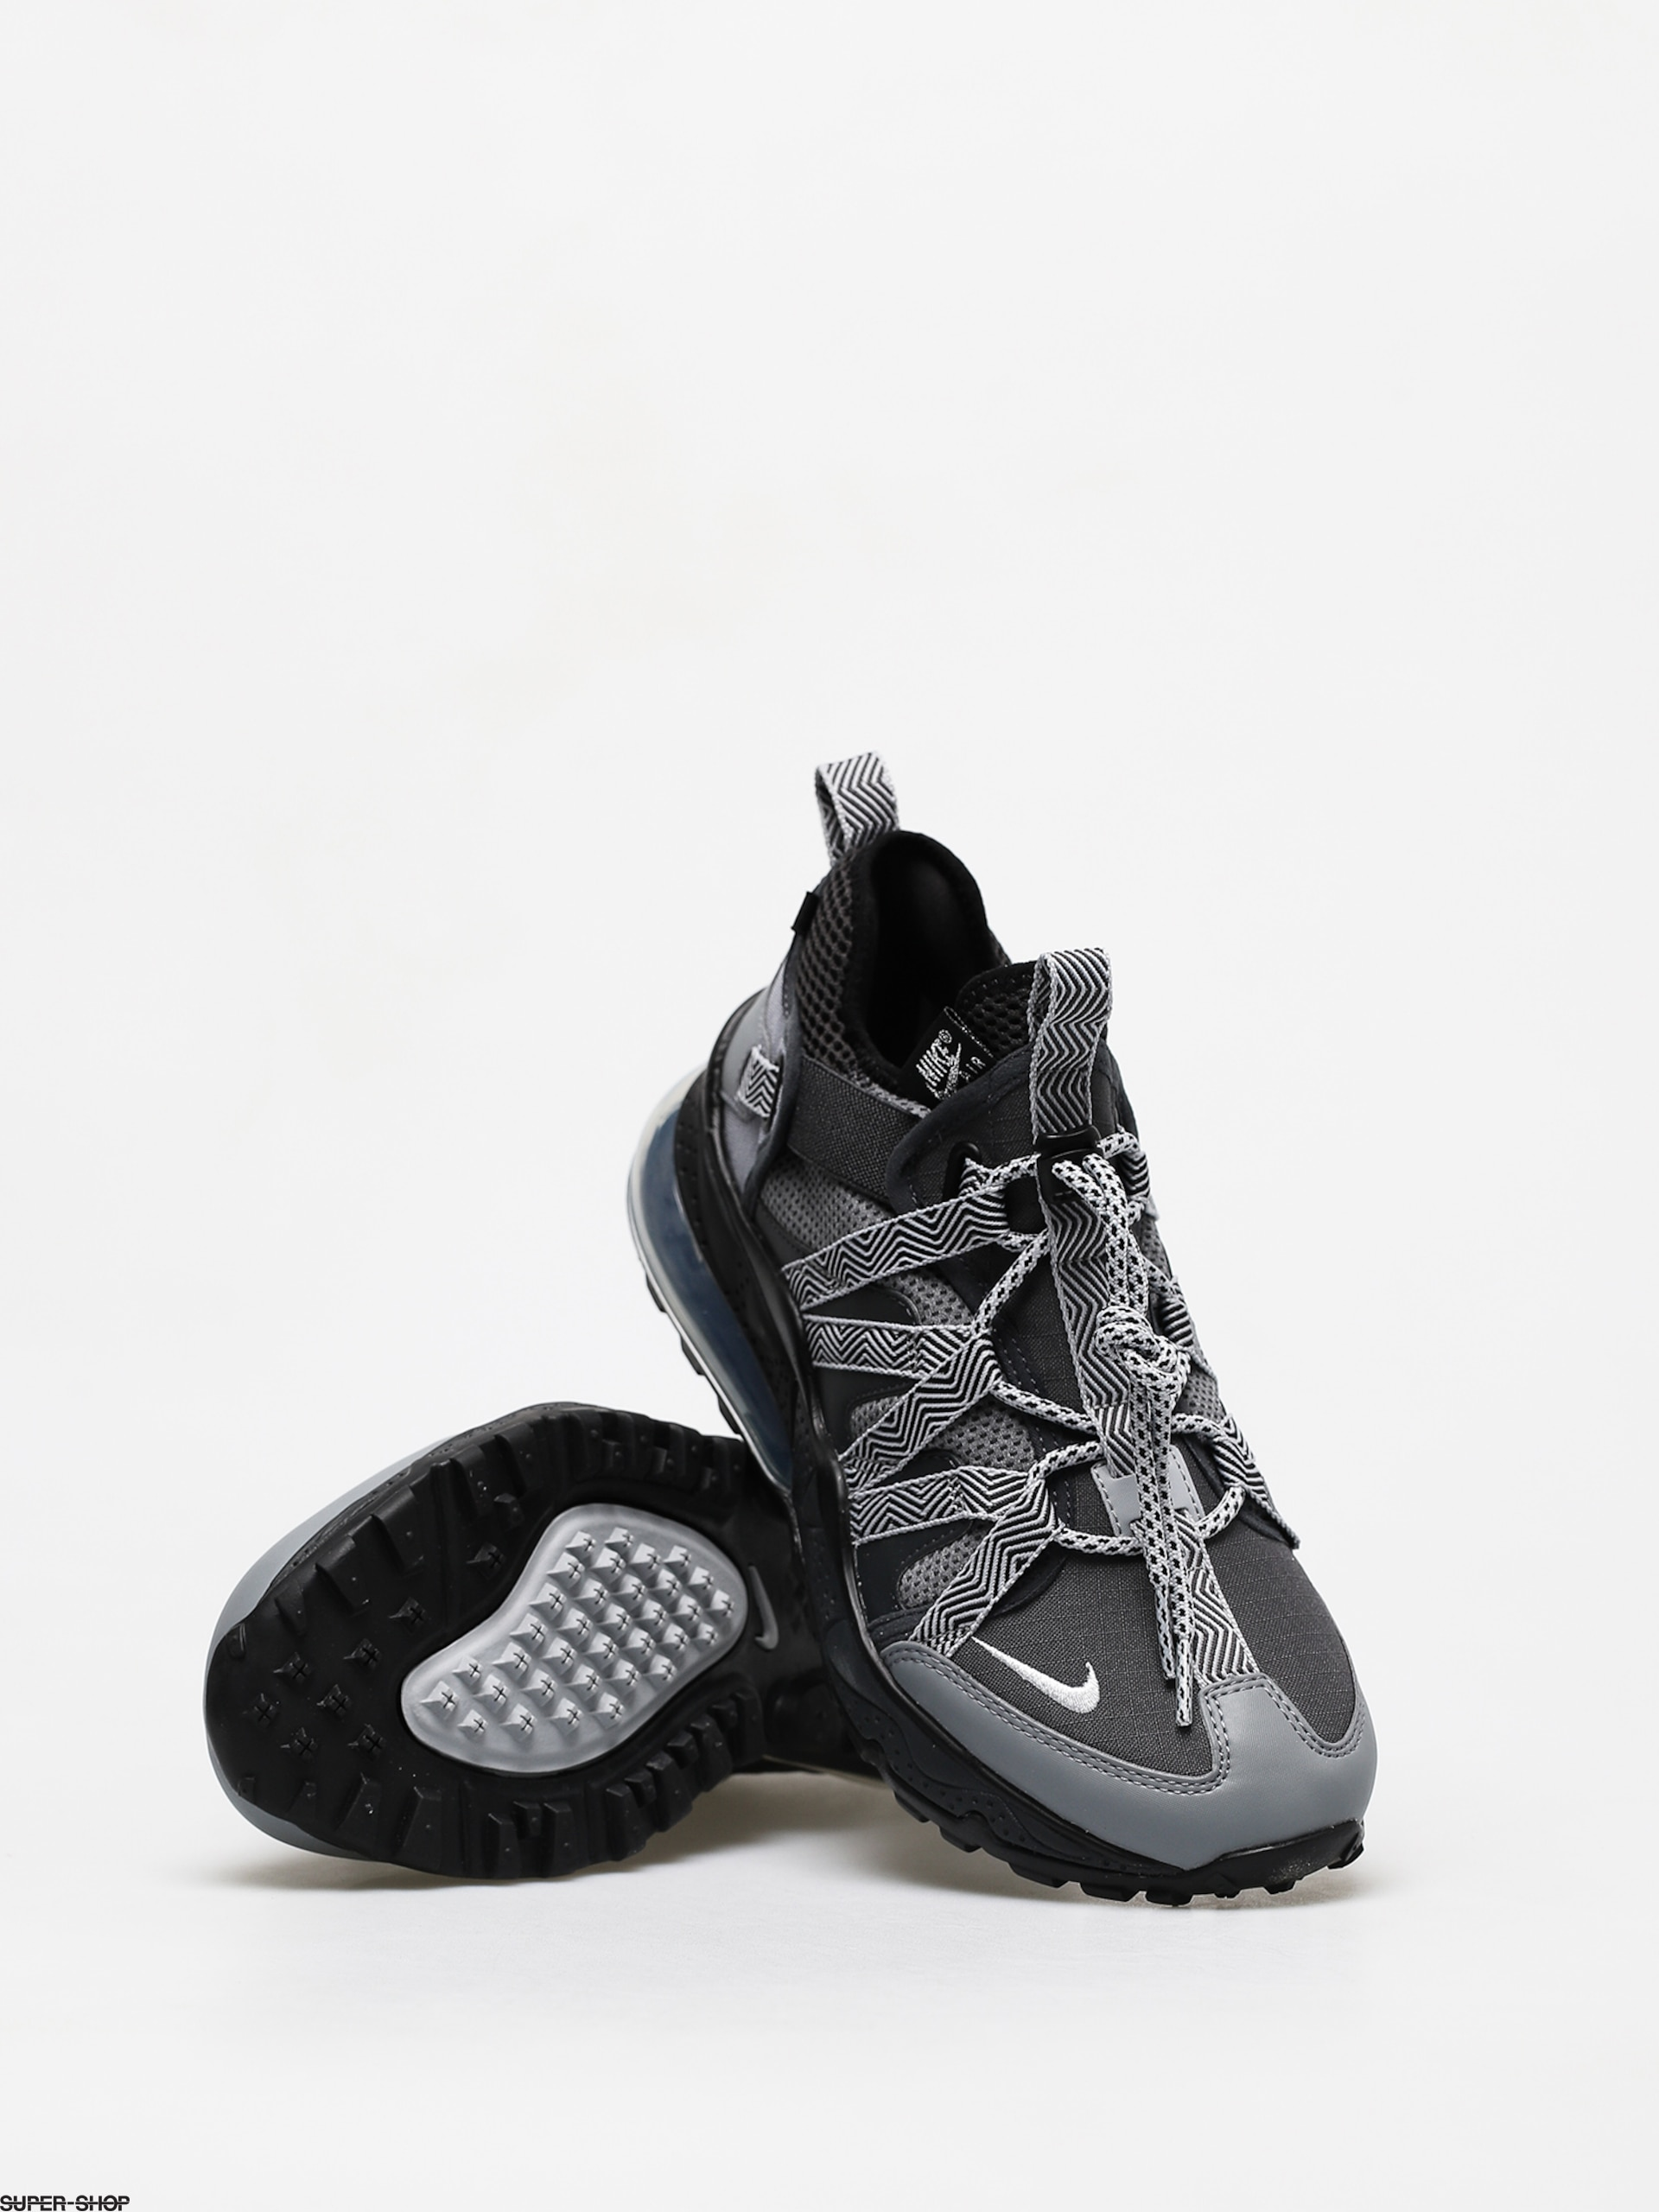 nike air max 270 bowfin black & anthracite